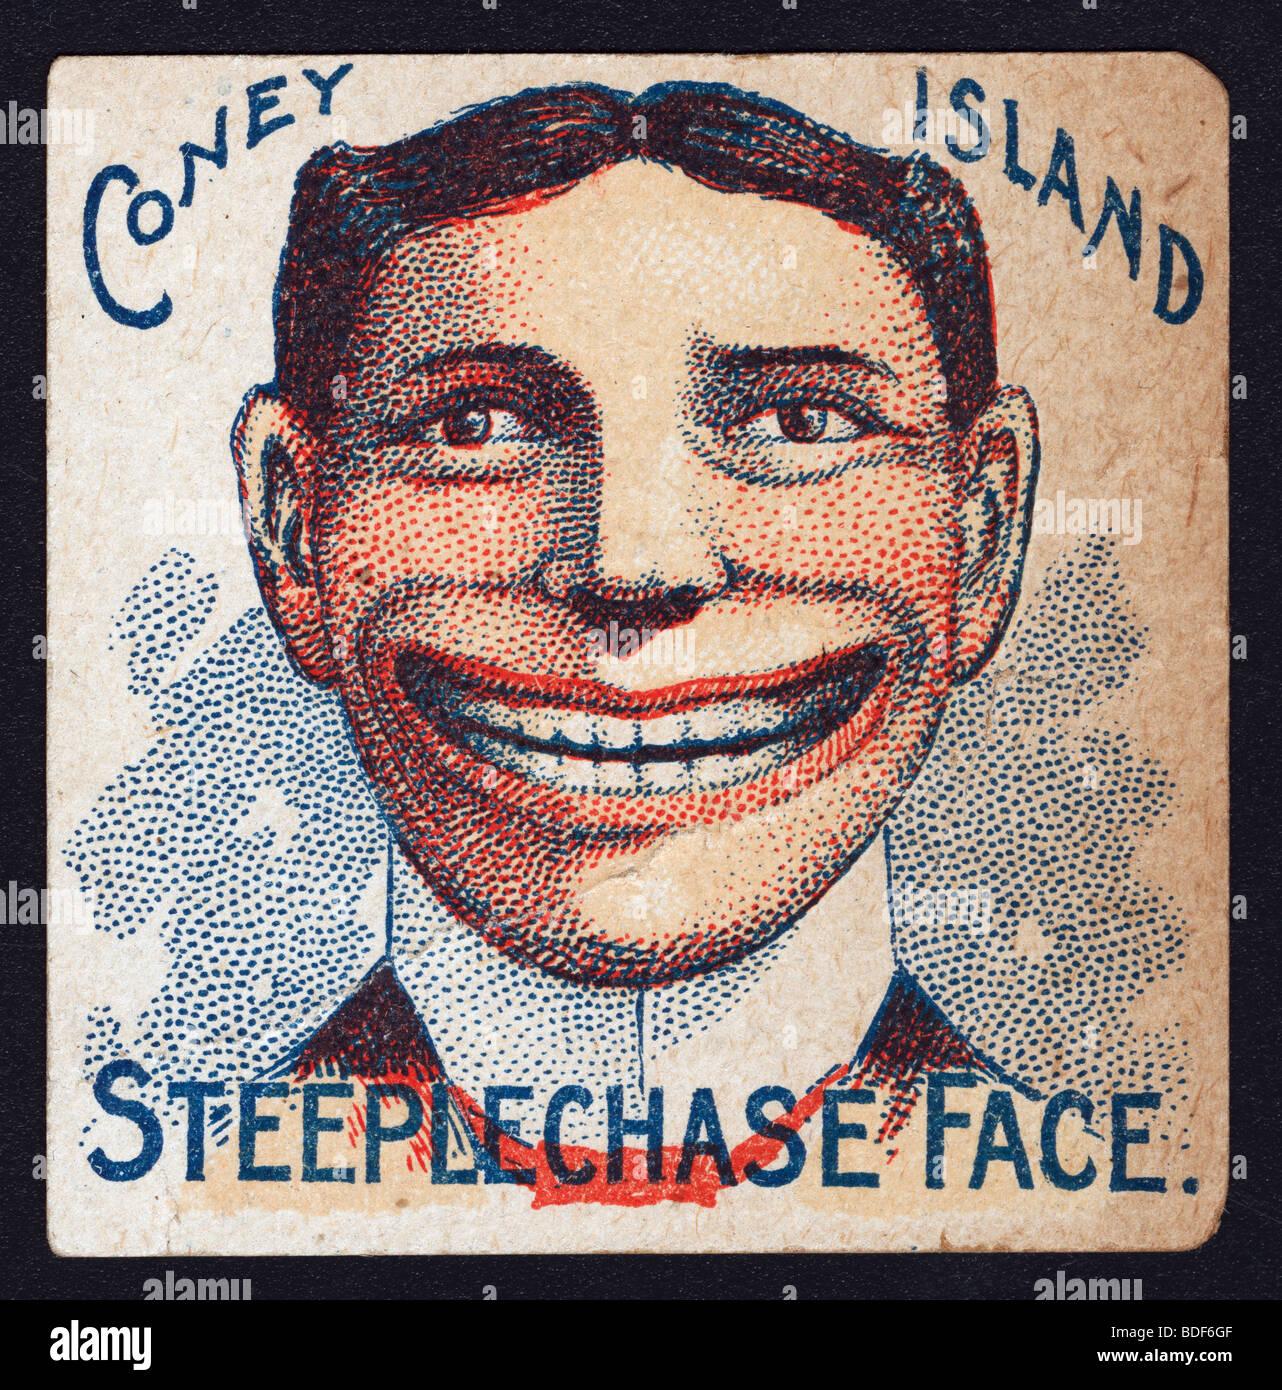 Coney Island Creepy Face